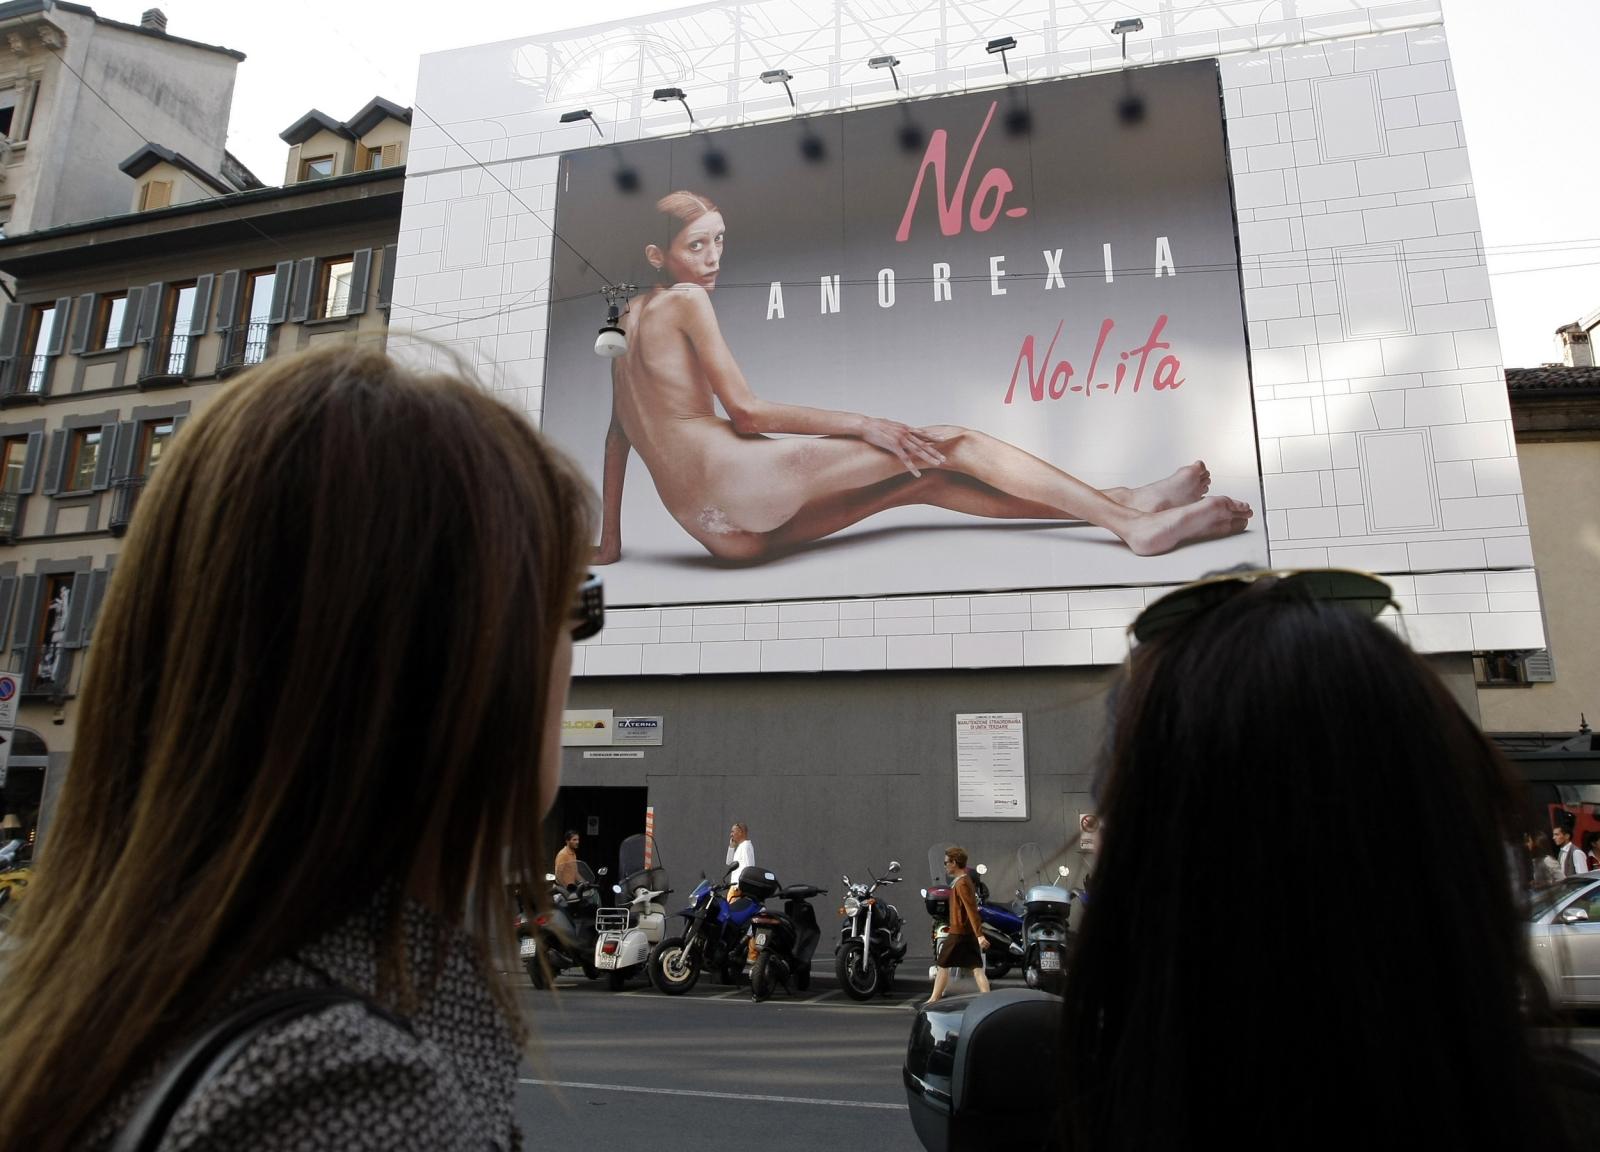 Emaciated woman billboard Milan